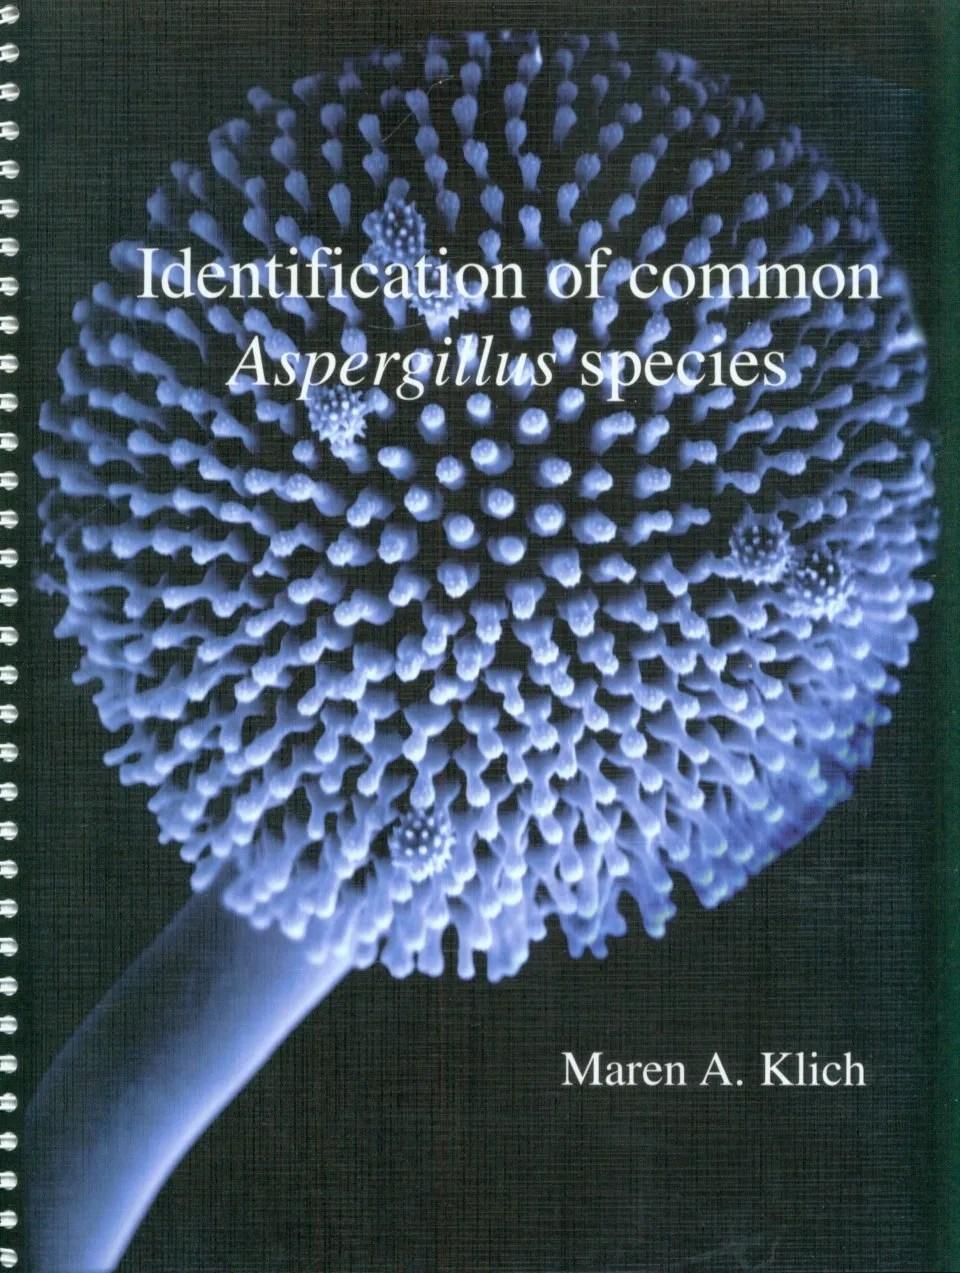 Aspergilus Wentii : aspergilus, wentii, Identification, Common, Aspergillus, Species, Field, Guides, Natural, History